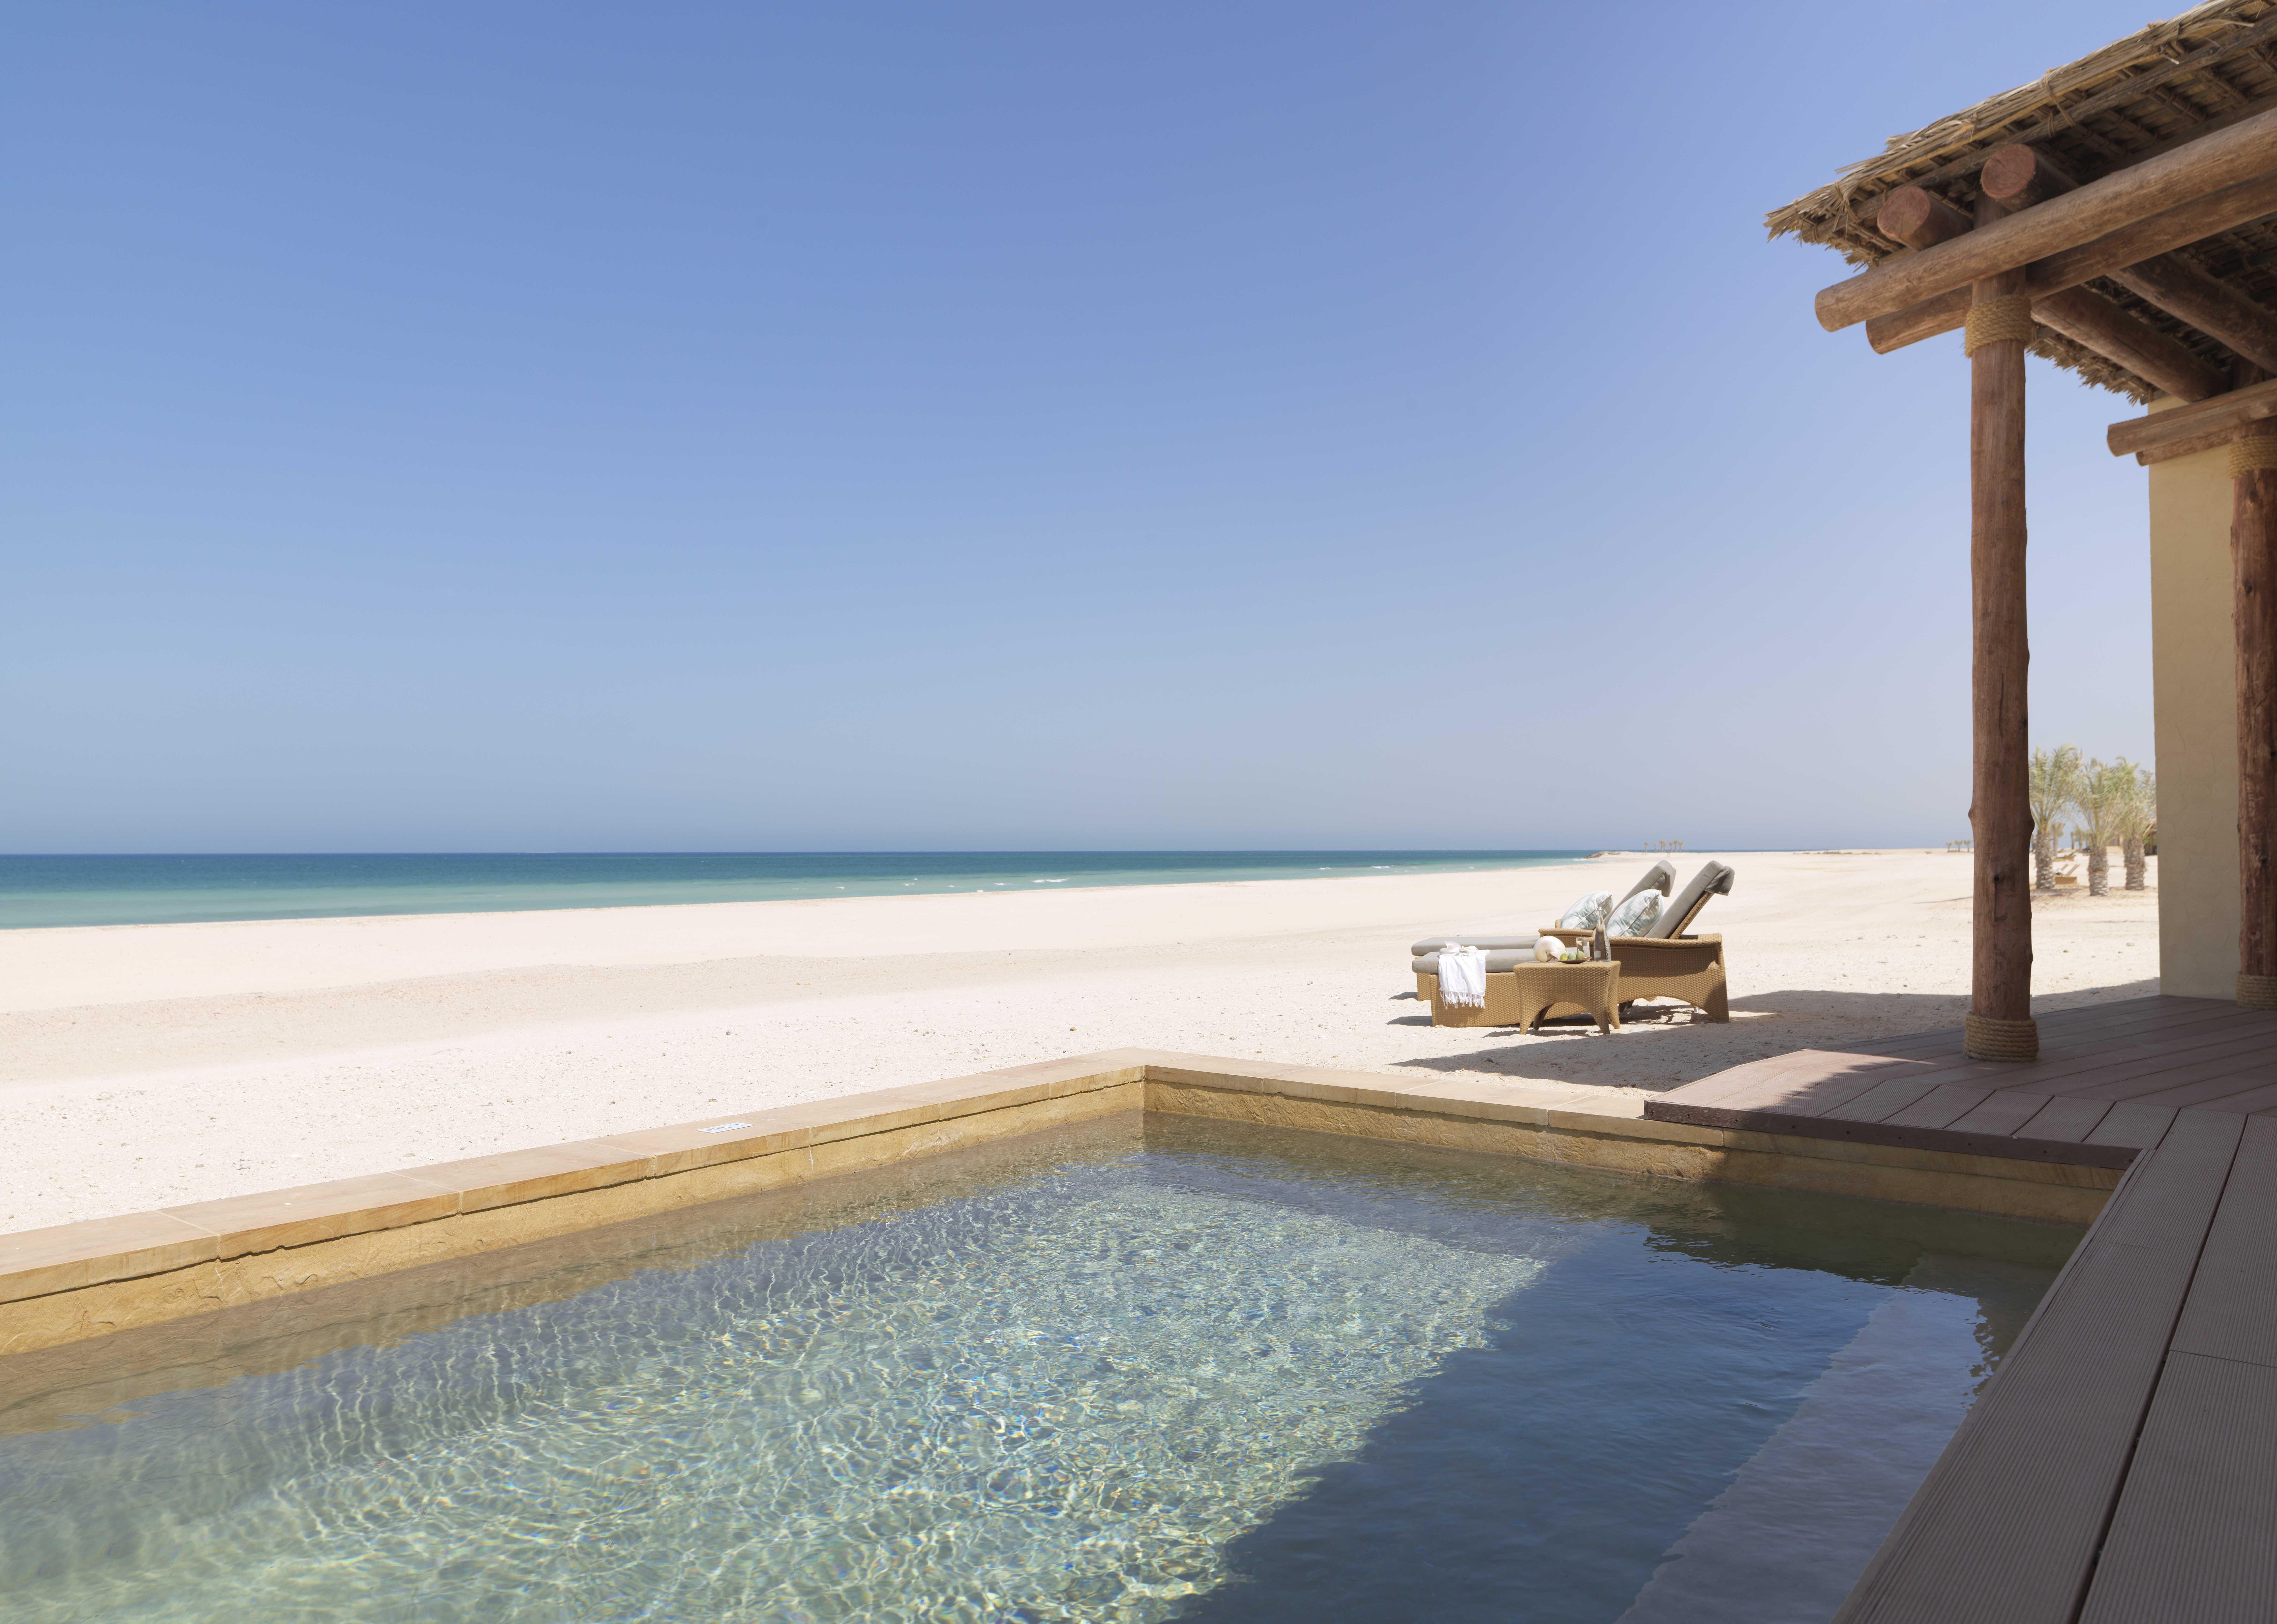 anantara sir bani yas island al yamm villa resort abu dhabi uae the luxury travel expert. Black Bedroom Furniture Sets. Home Design Ideas